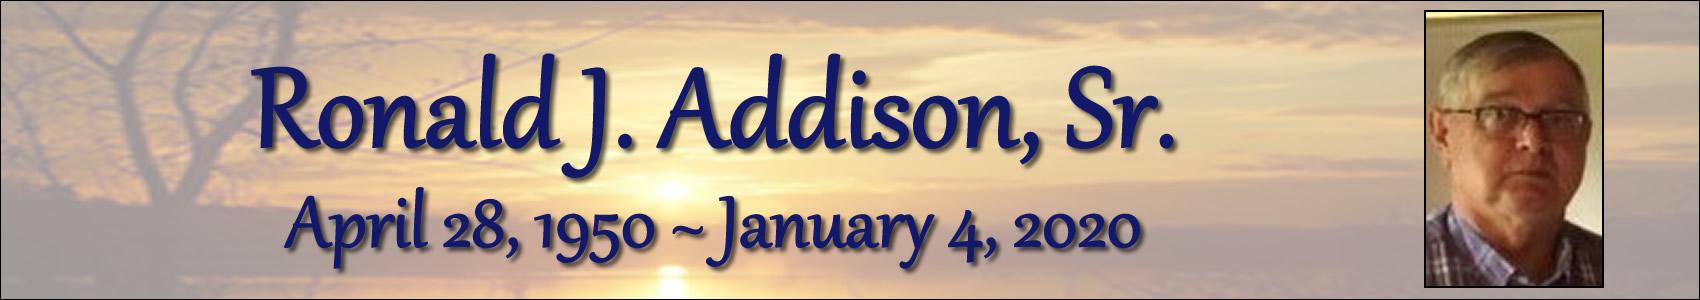 raddison2_obit_header